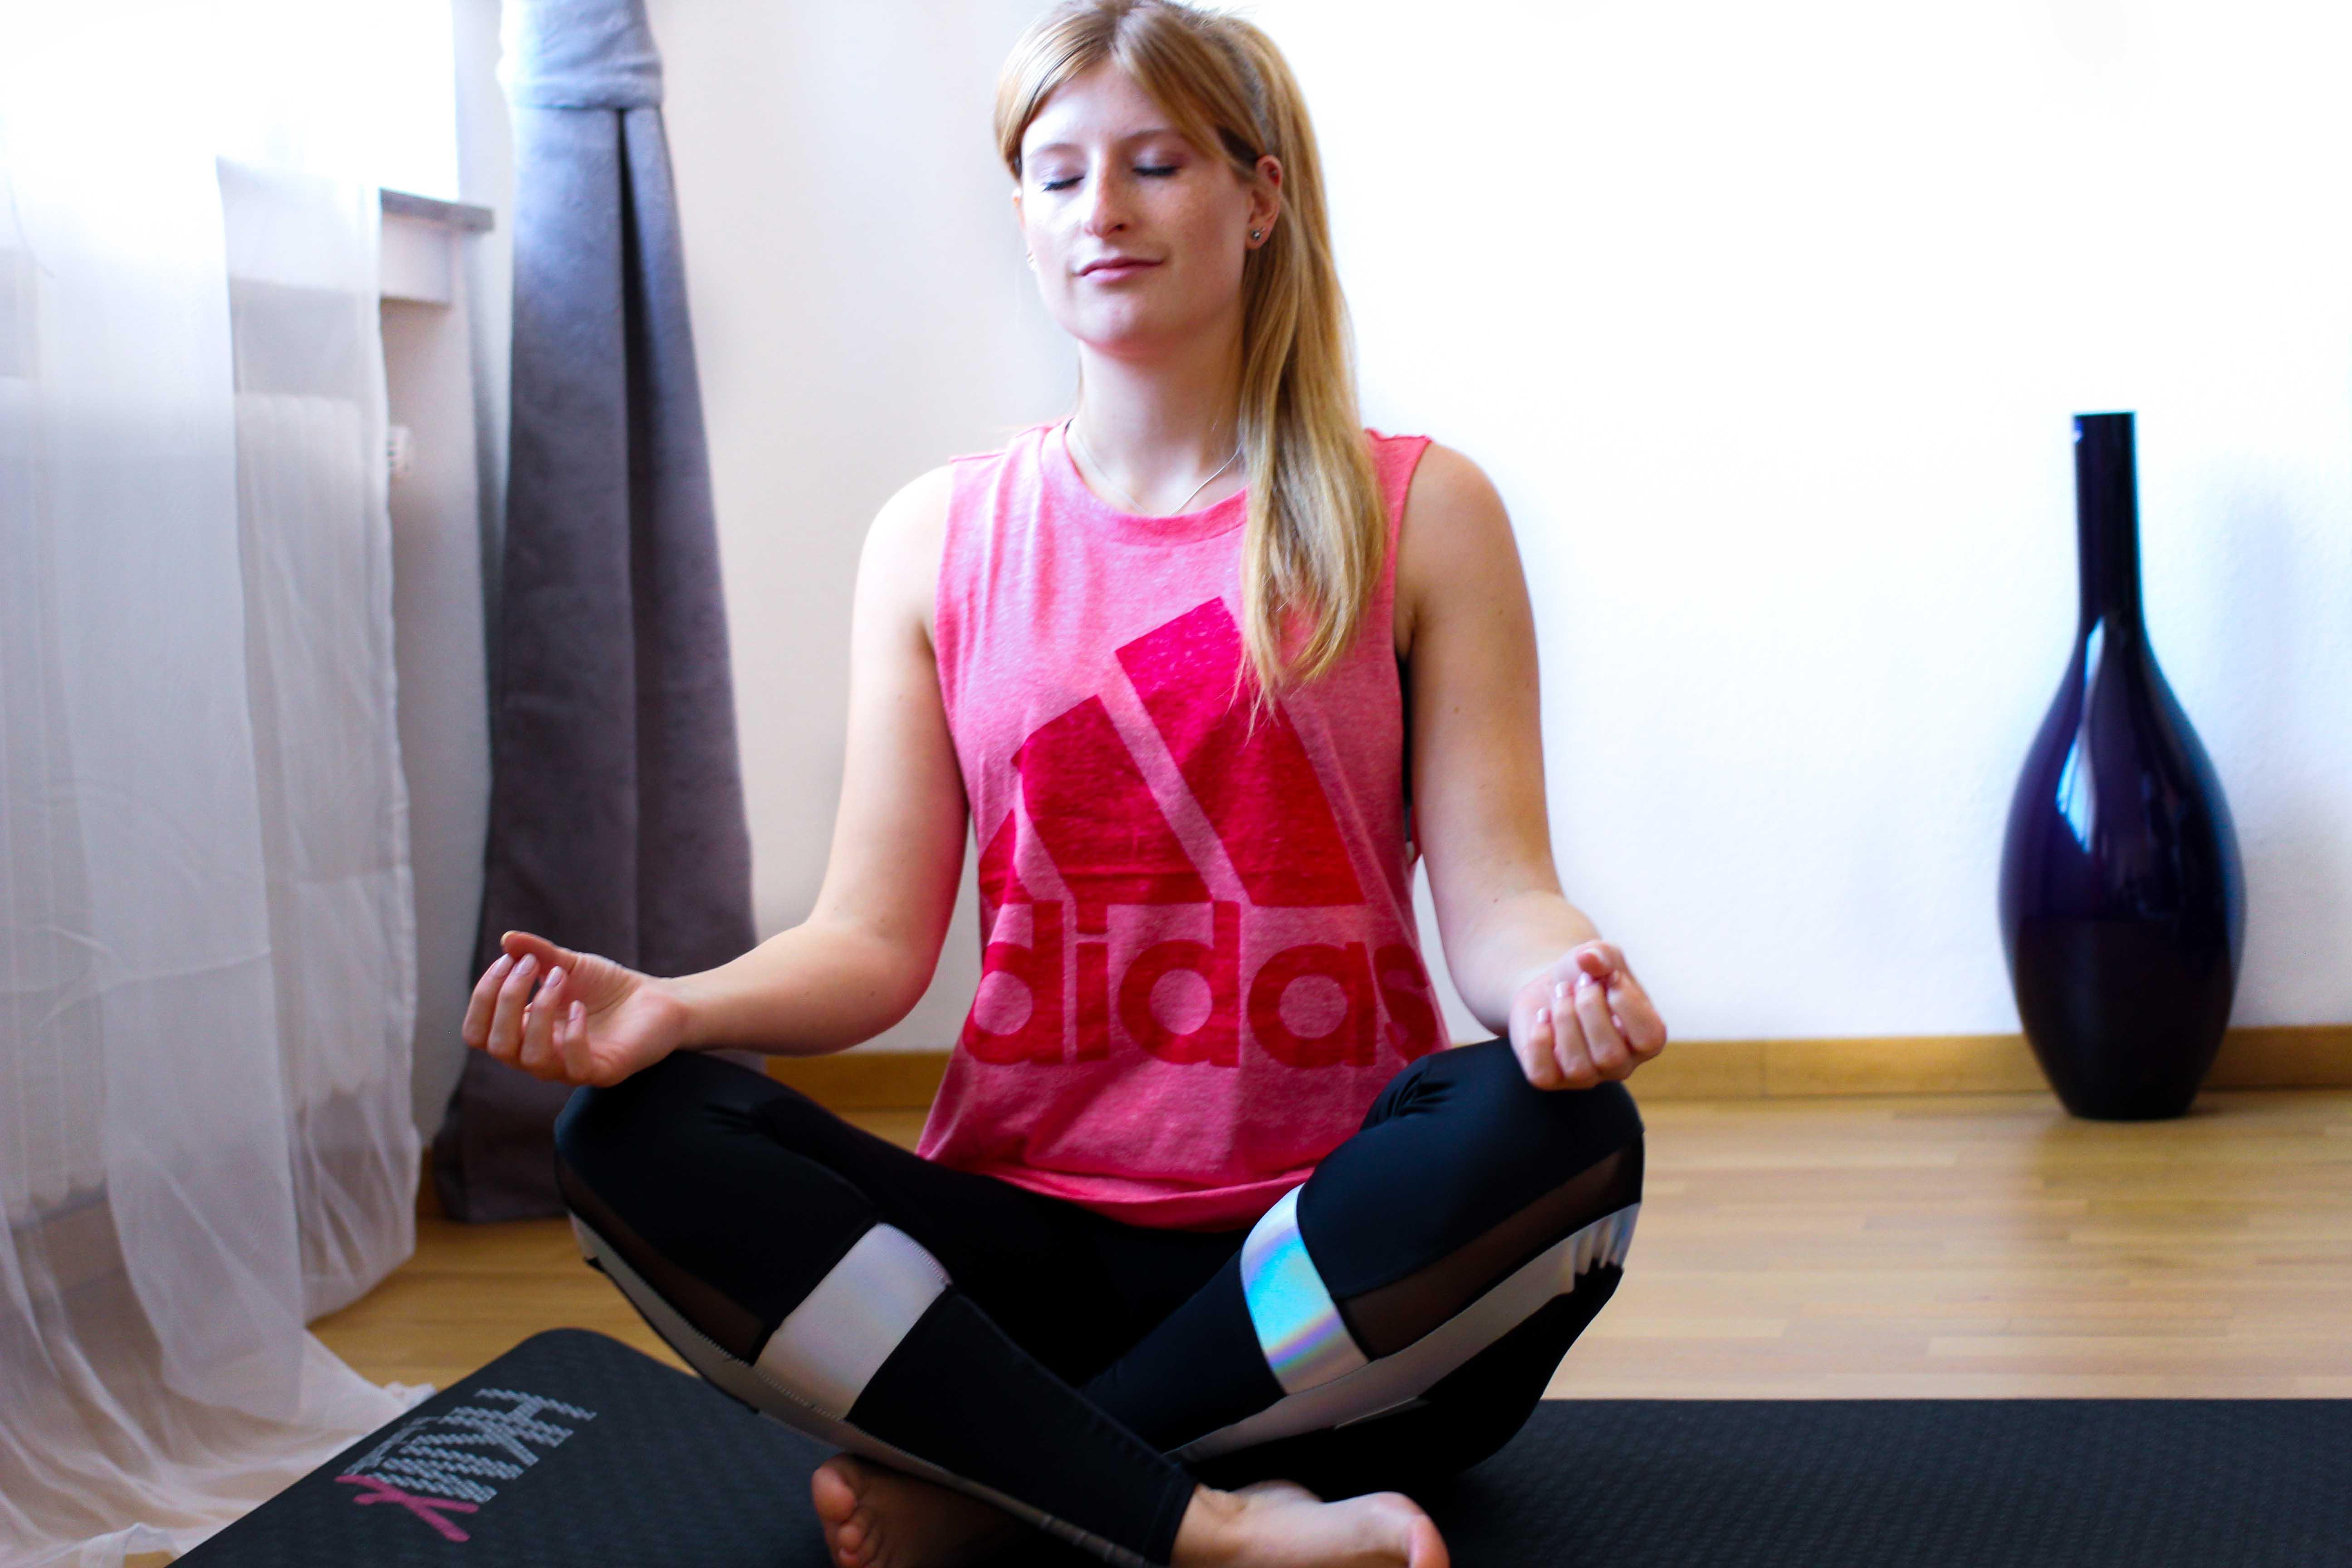 Yoga Outfit Zalando Ausstattung Adidas Sportoutfit Sporttrend Yoga Pose 1